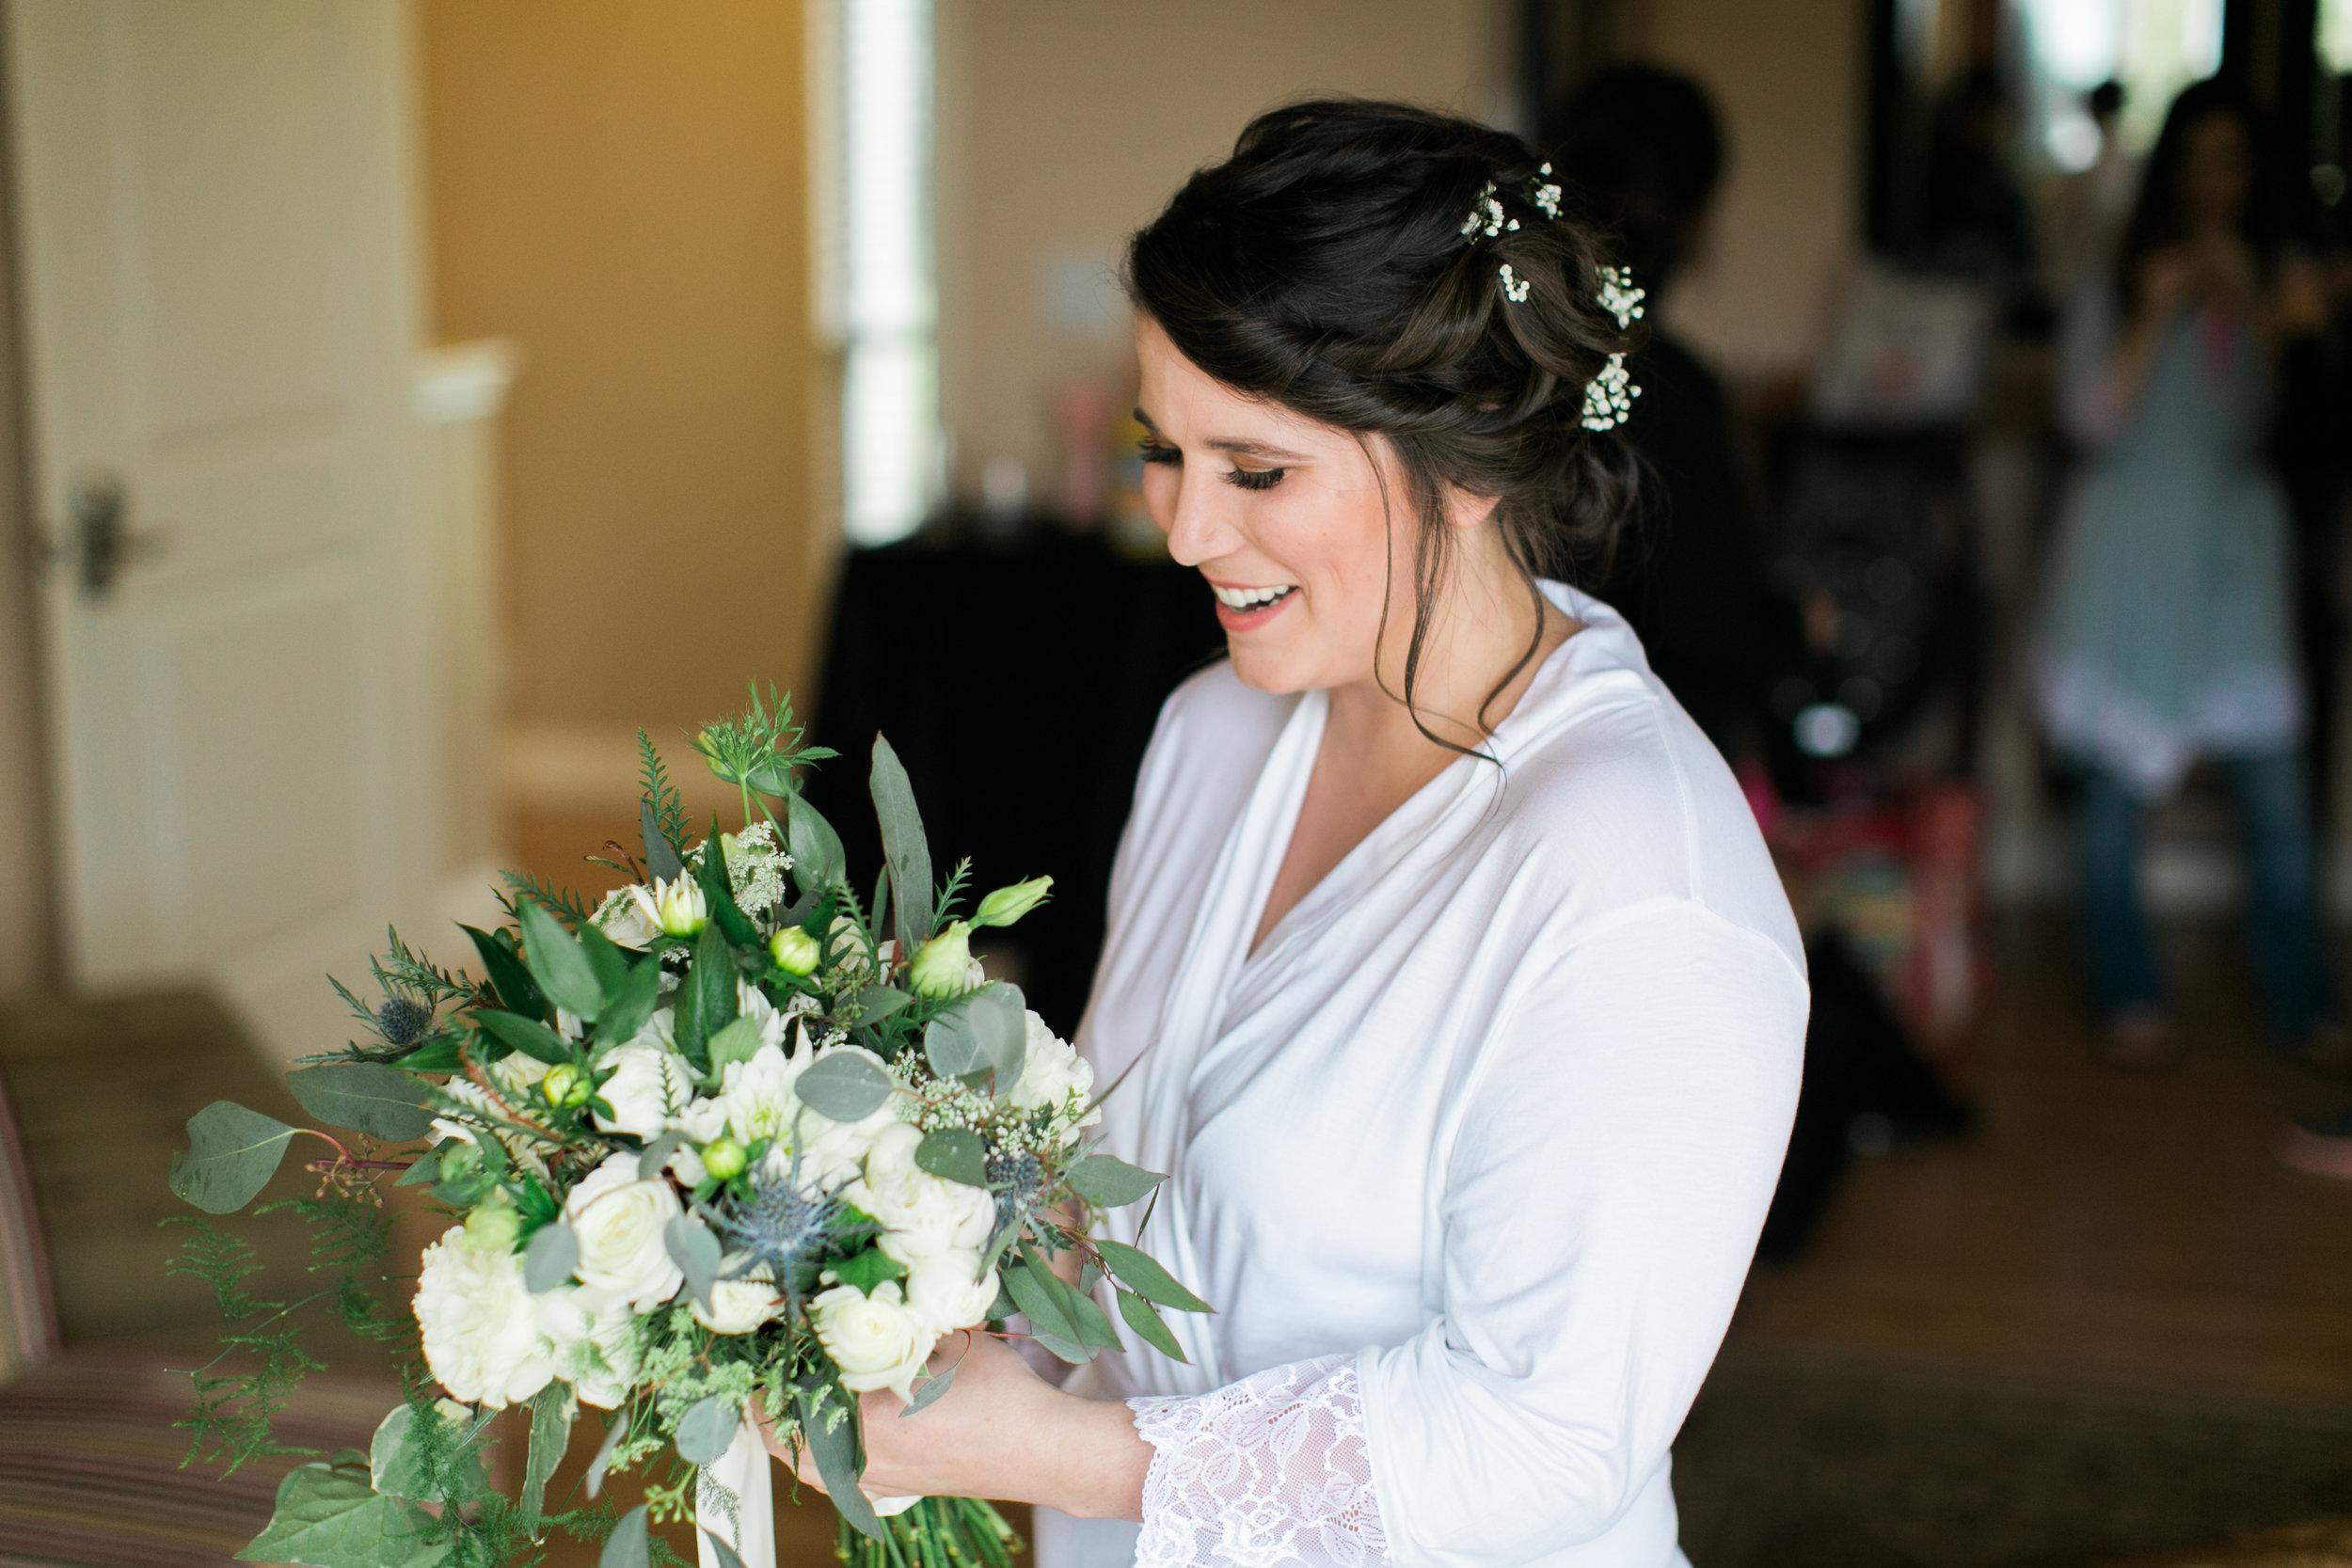 Austin_Texas_Fine_Art_Wedding_Photographer_Kayla_Snell_Photography_Antebellum_Oaks40.jpg